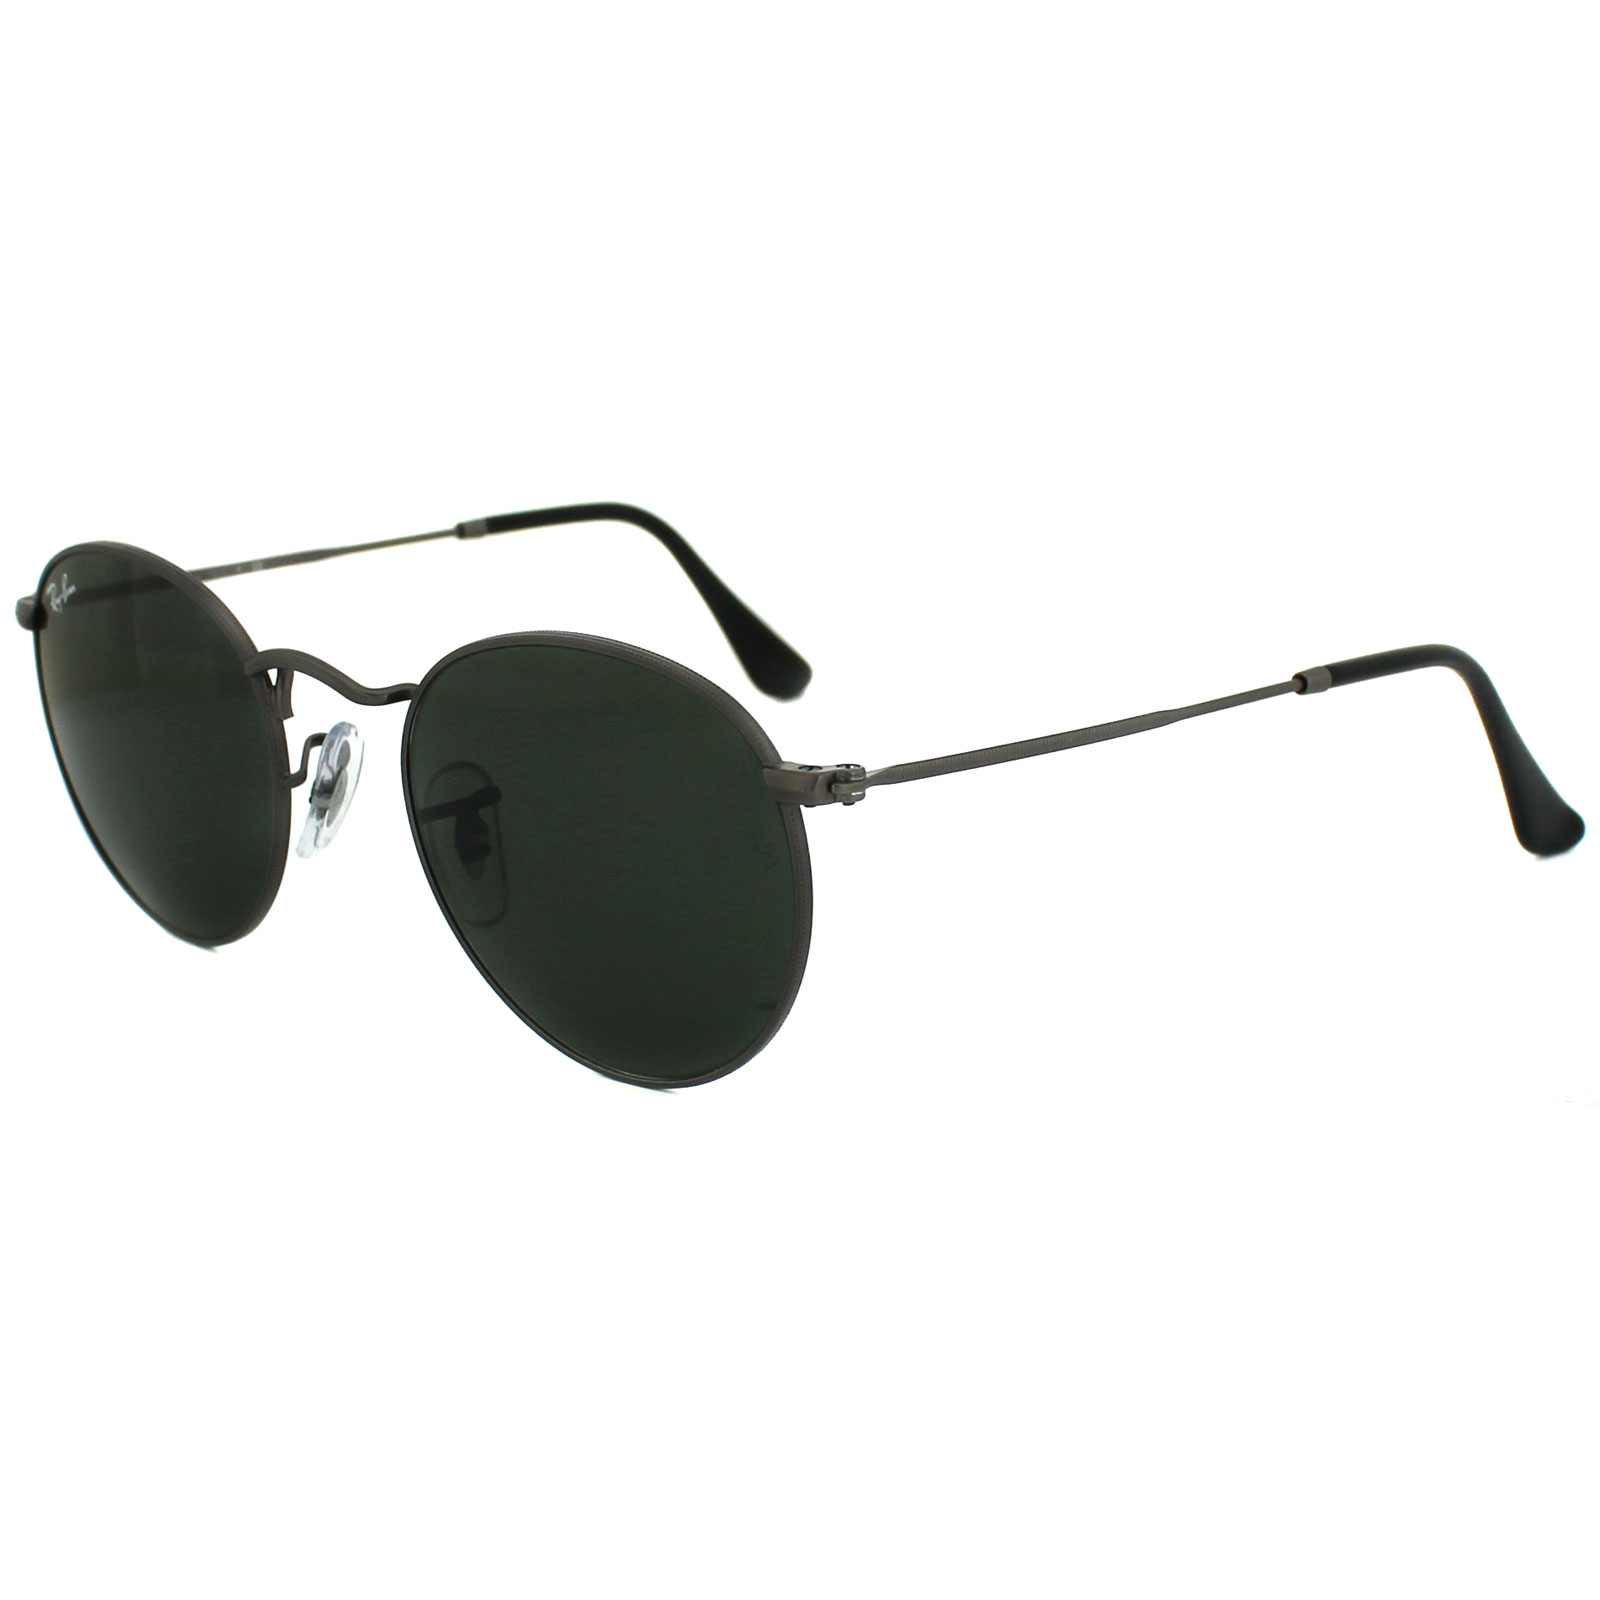 Sentinel Ray-Ban Sunglasses Round Metal 3447 029 Matt Gunmetal Green Small  47mm e3816a7513